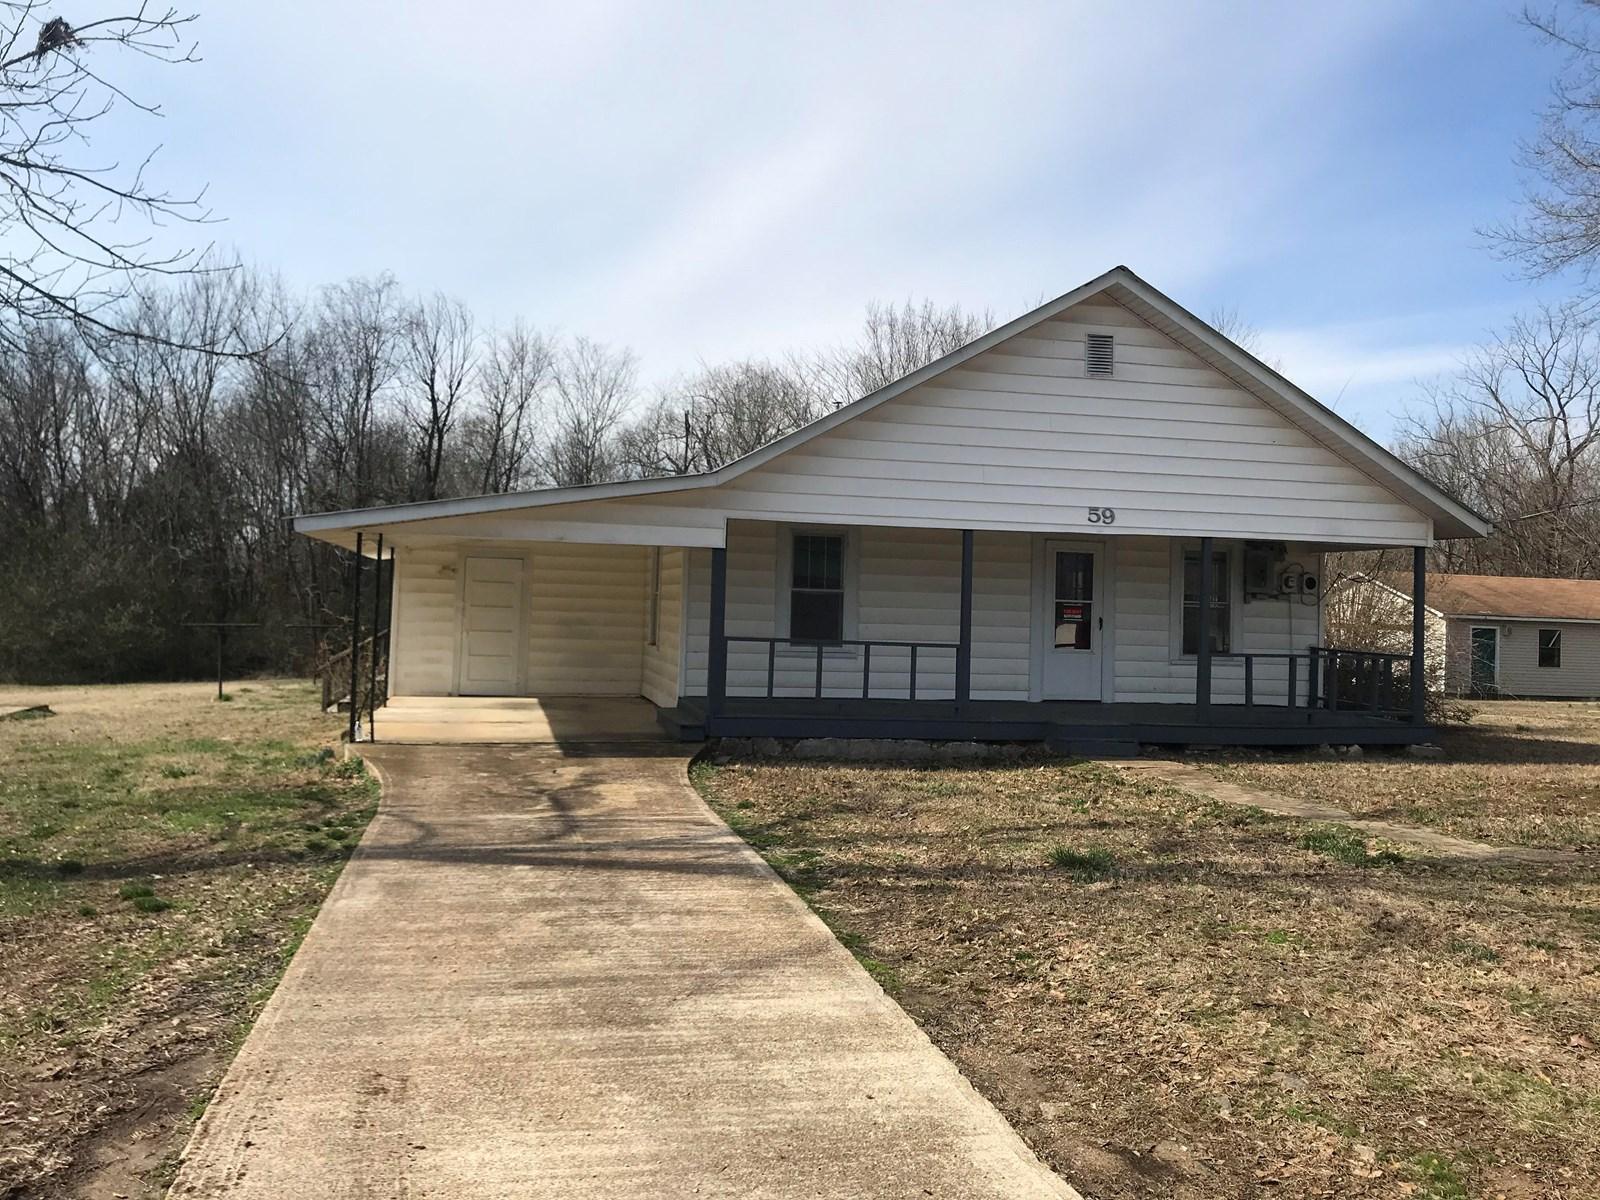 Investment/retirement property Ash Flat, Arkansas for sale